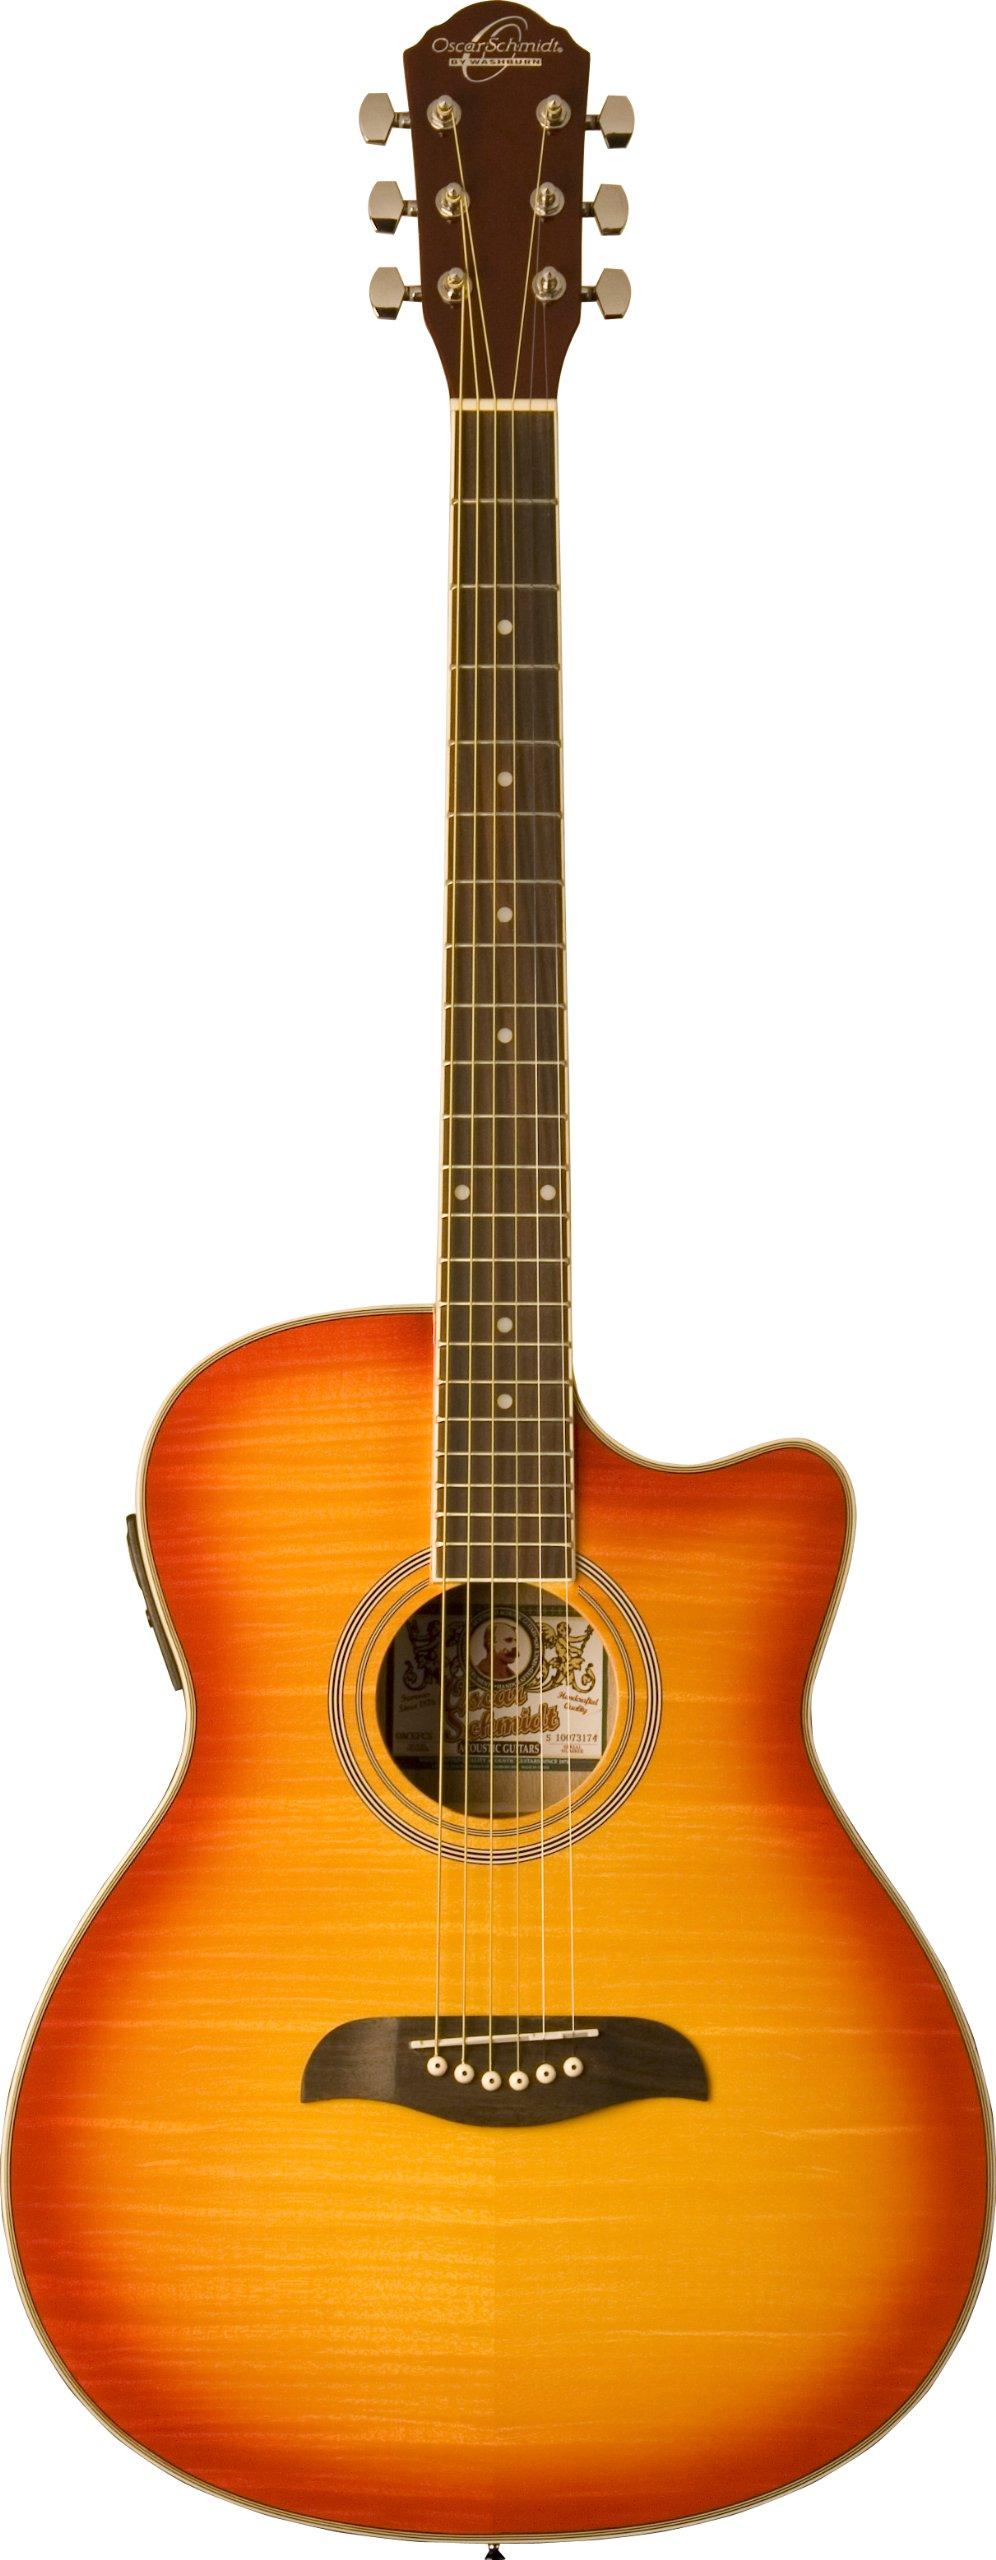 Oscar Schmidt OACEFCS Acoustic-Electric Guitar - Cherry Sunburst